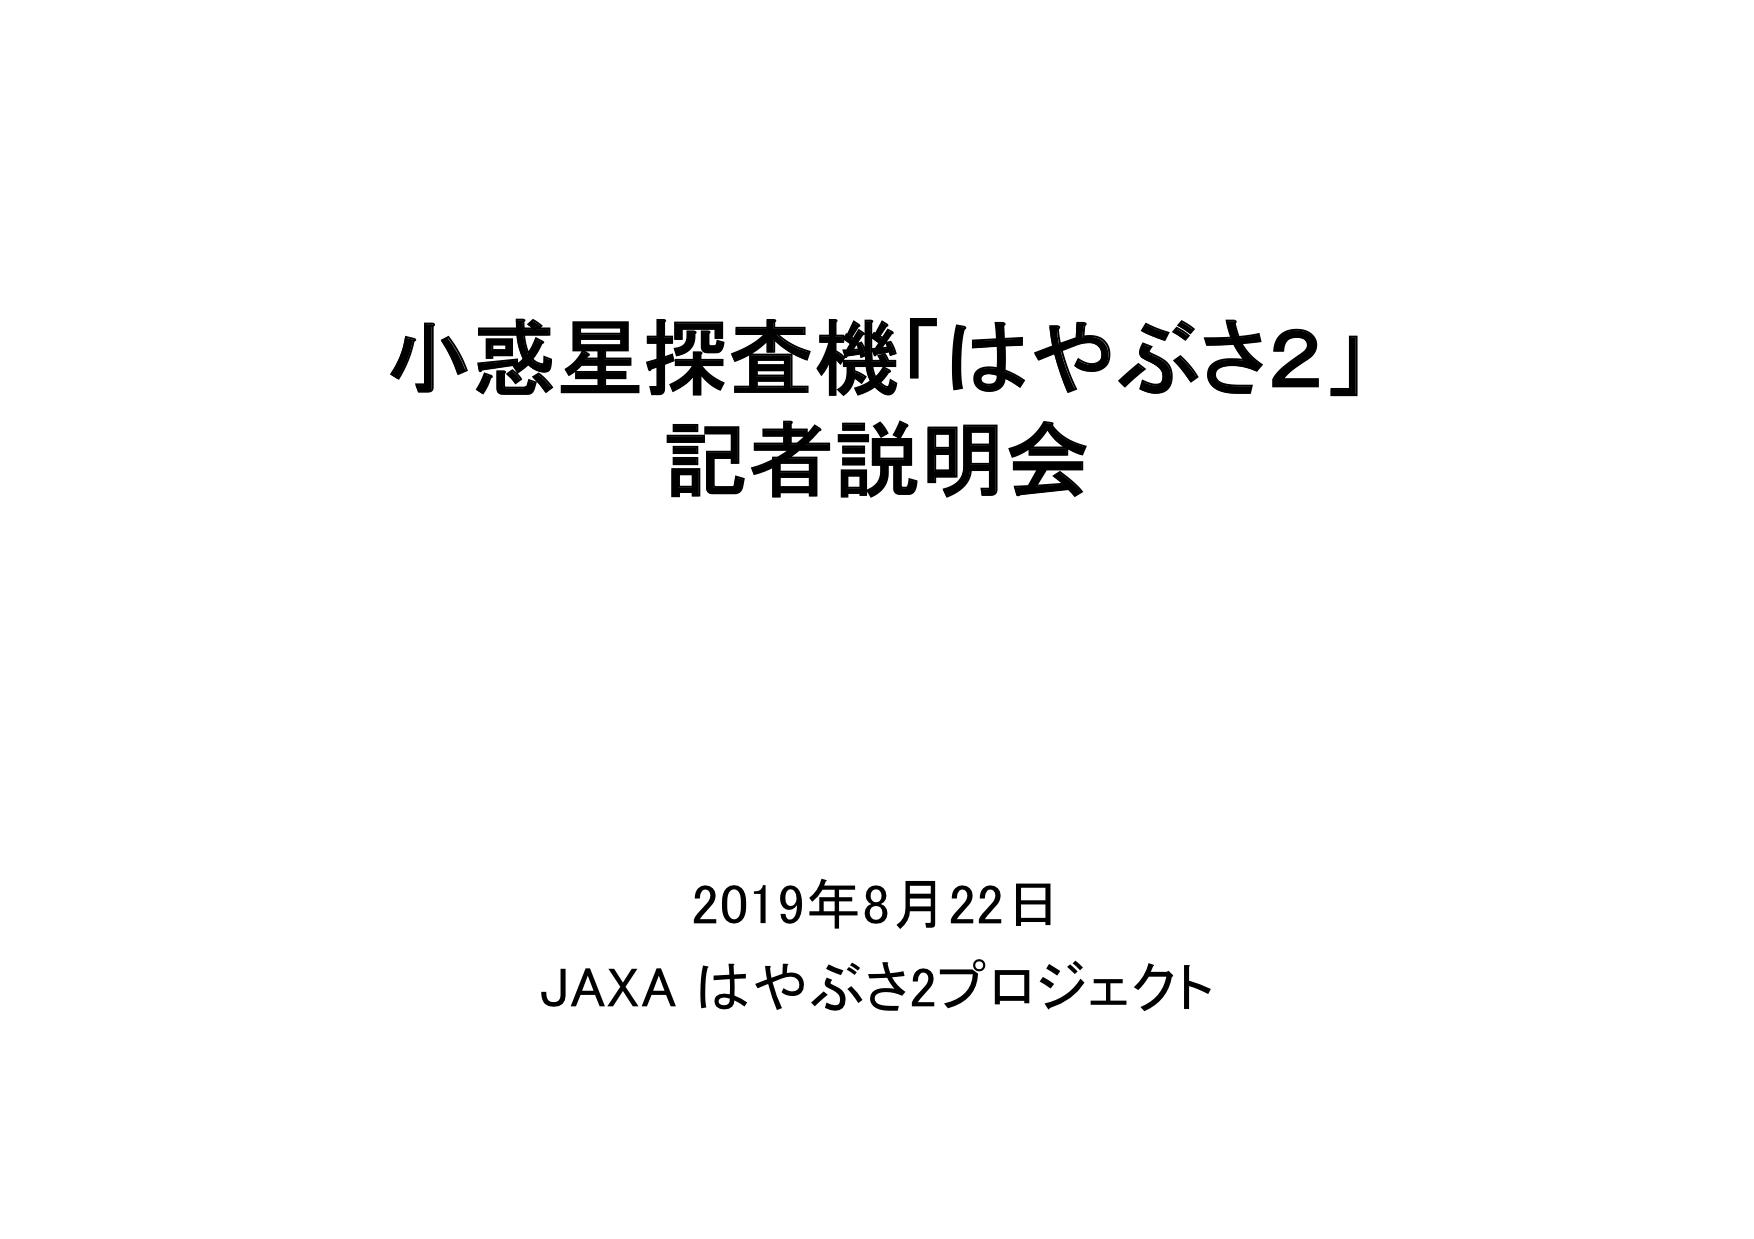 f:id:Imamura:20190822150520p:plain